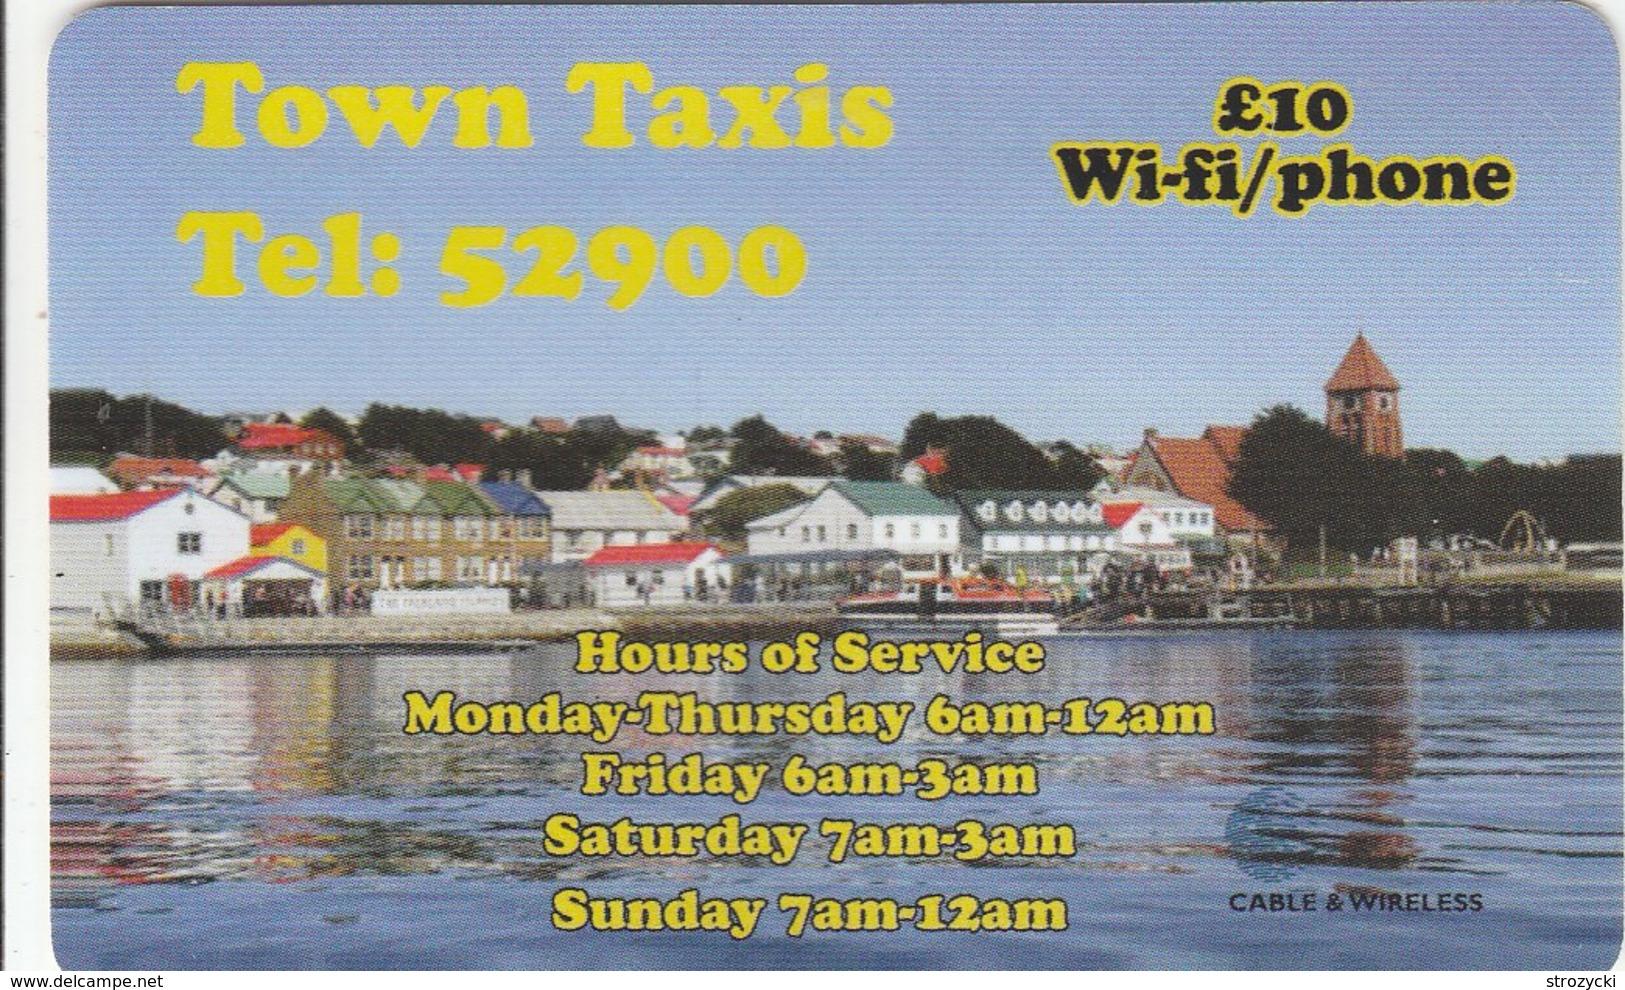 Falkland Islands - Town Taxis - Falkland Islands